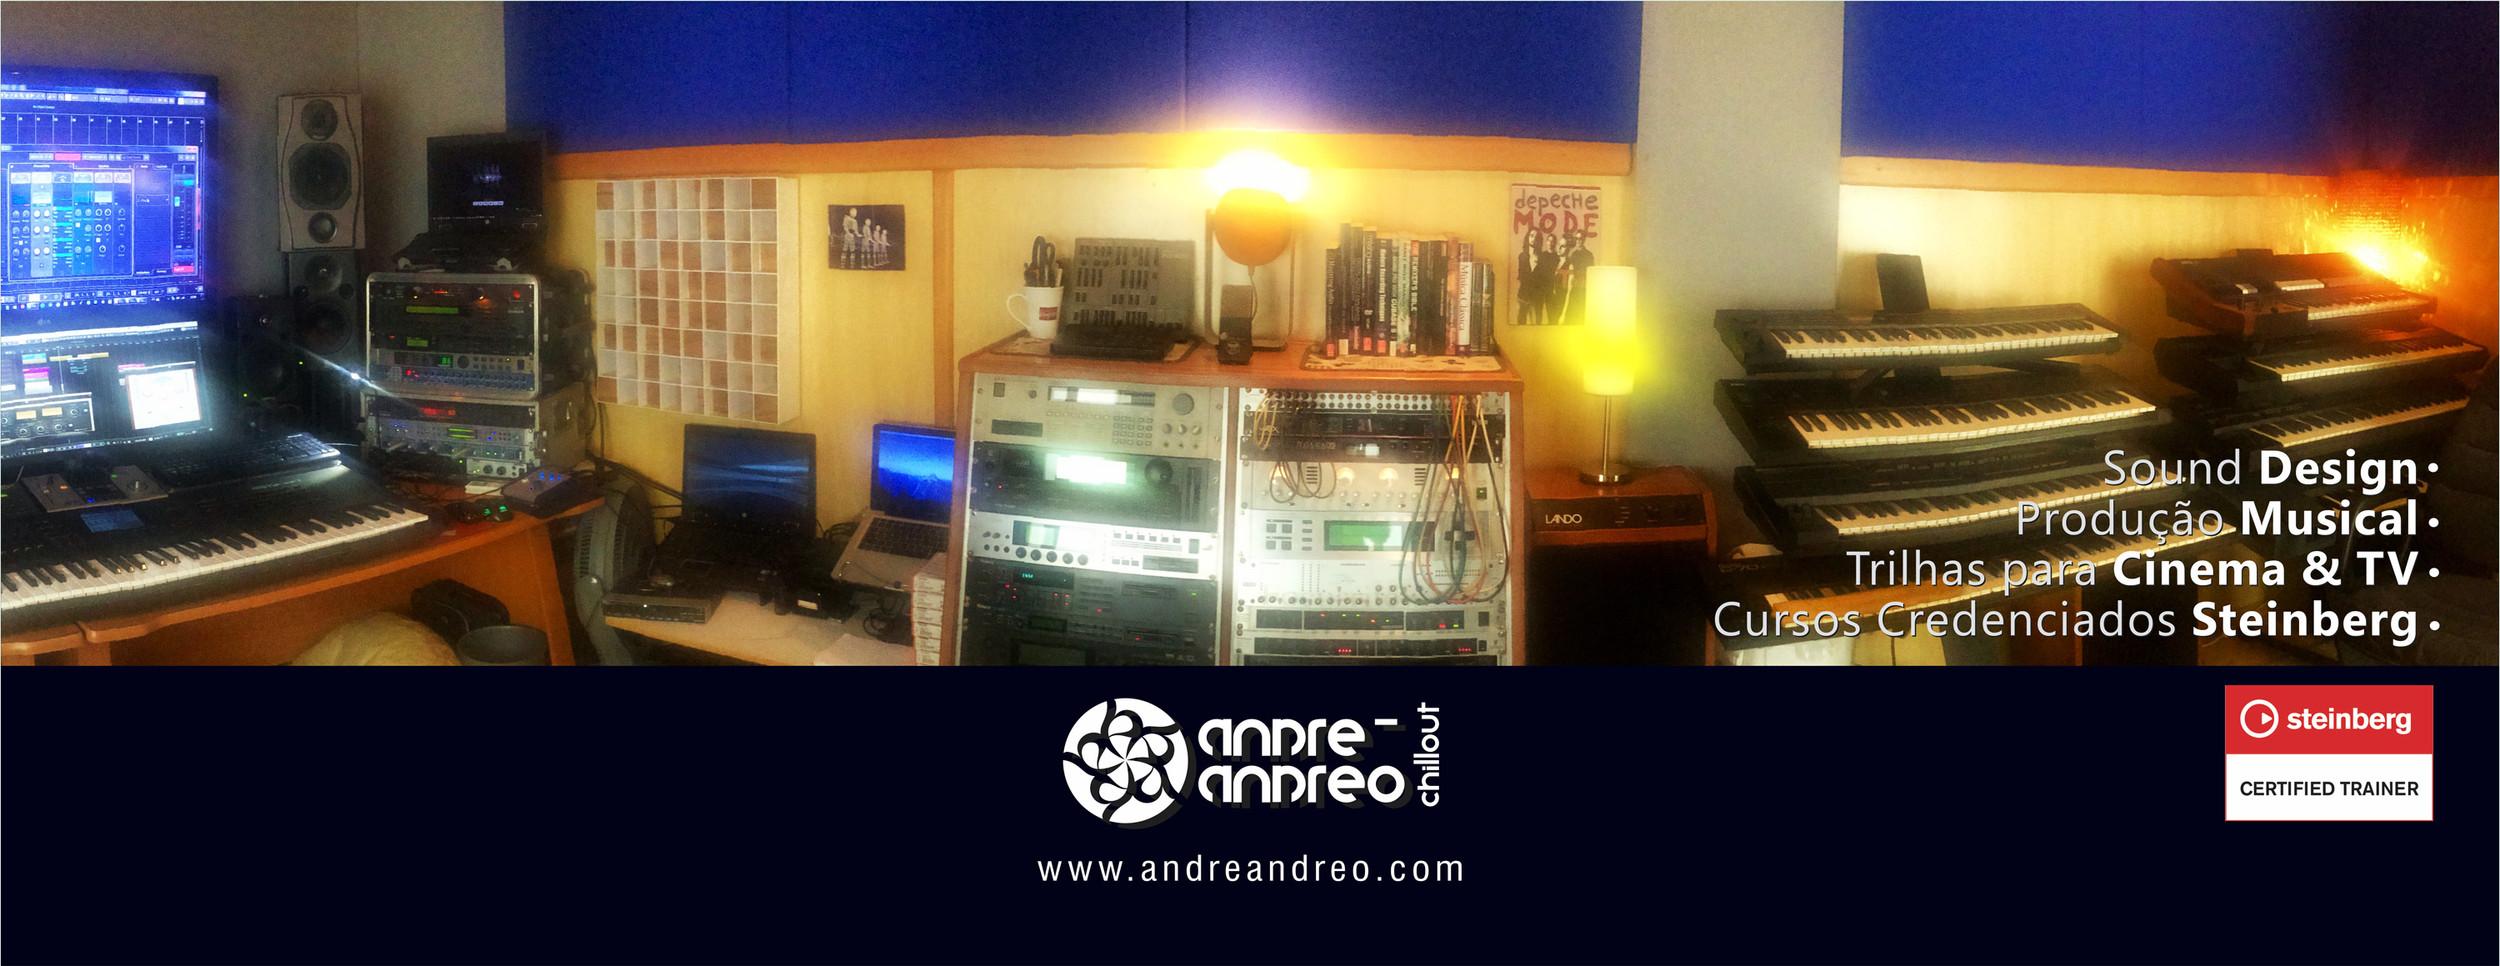 (c) Andreandreo.com